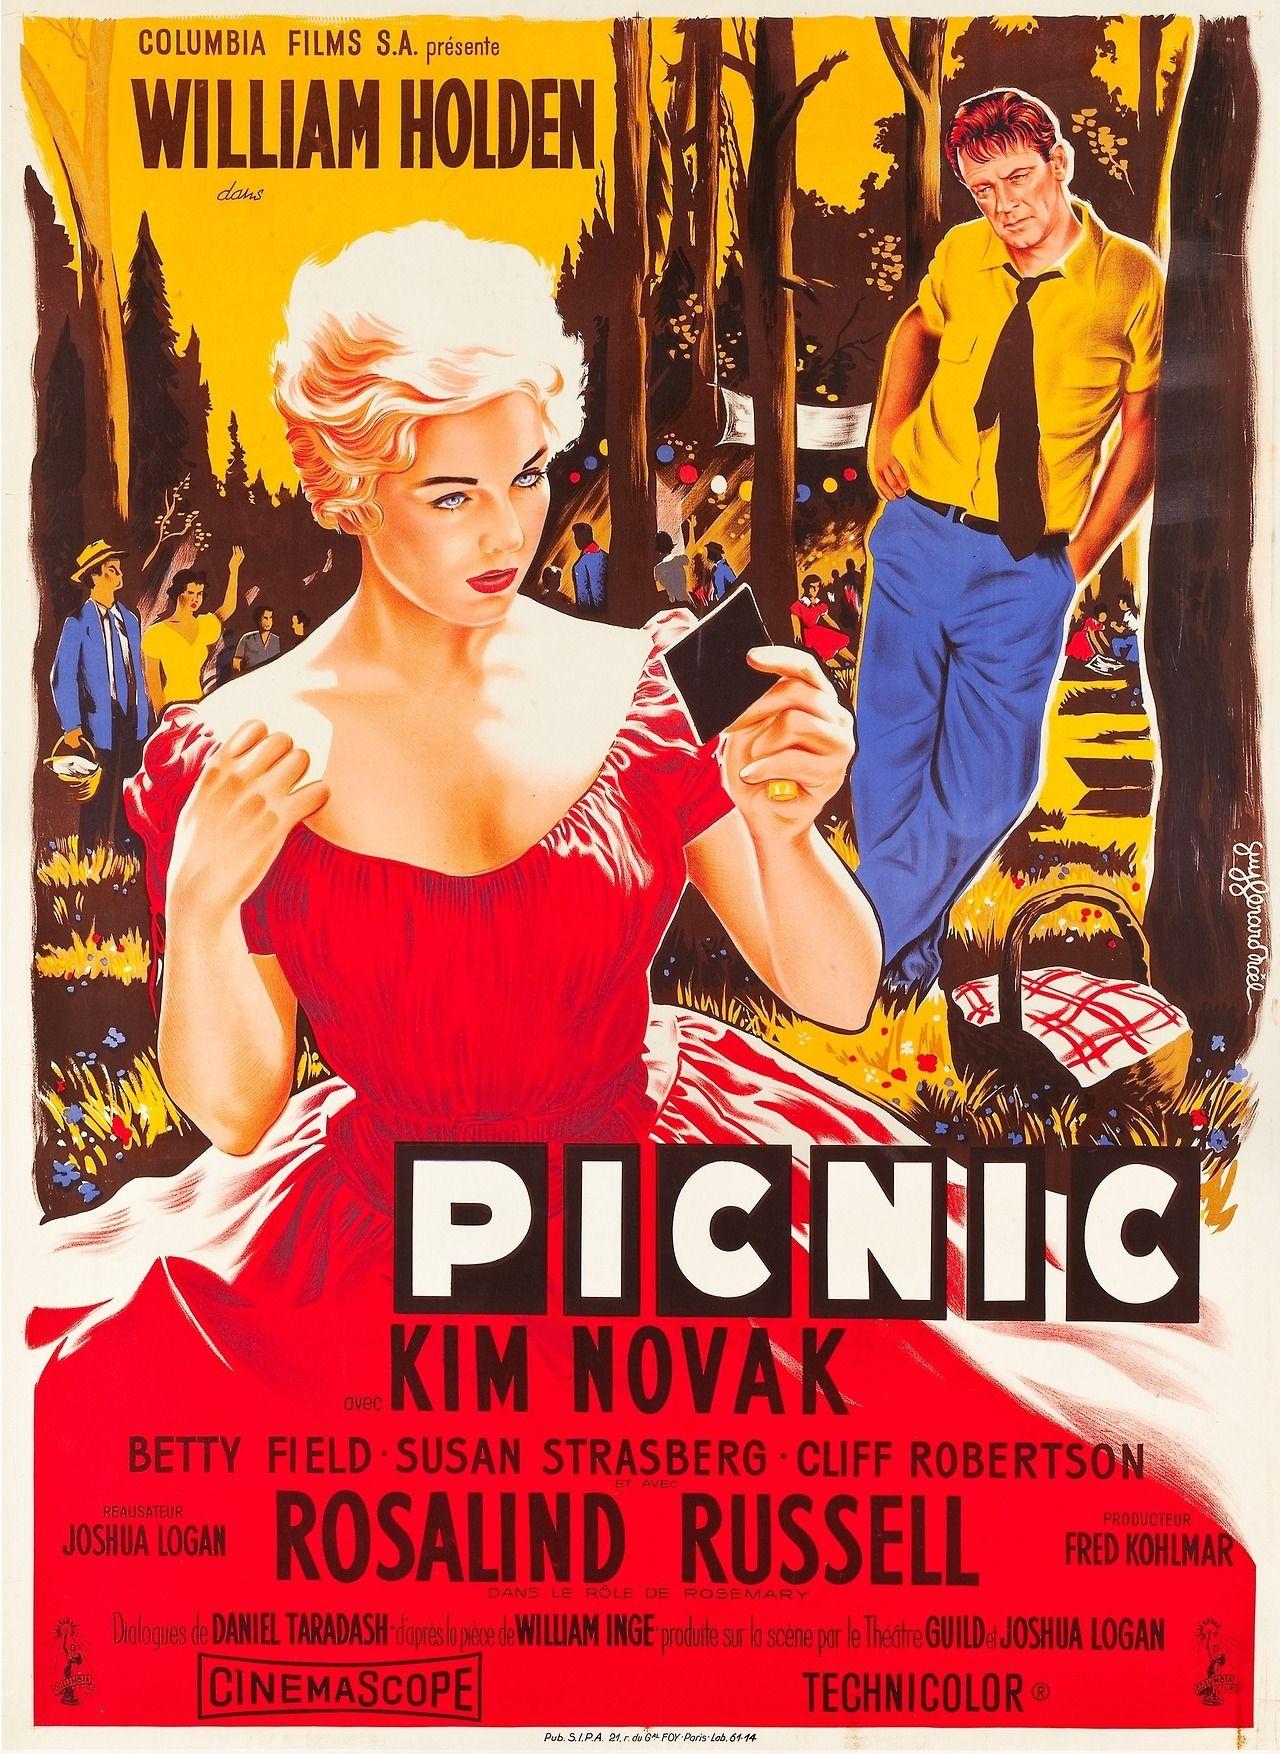 PICNIC Movie POSTER 27x40 C William Holden Kim Novak Rosalind Russell Susan